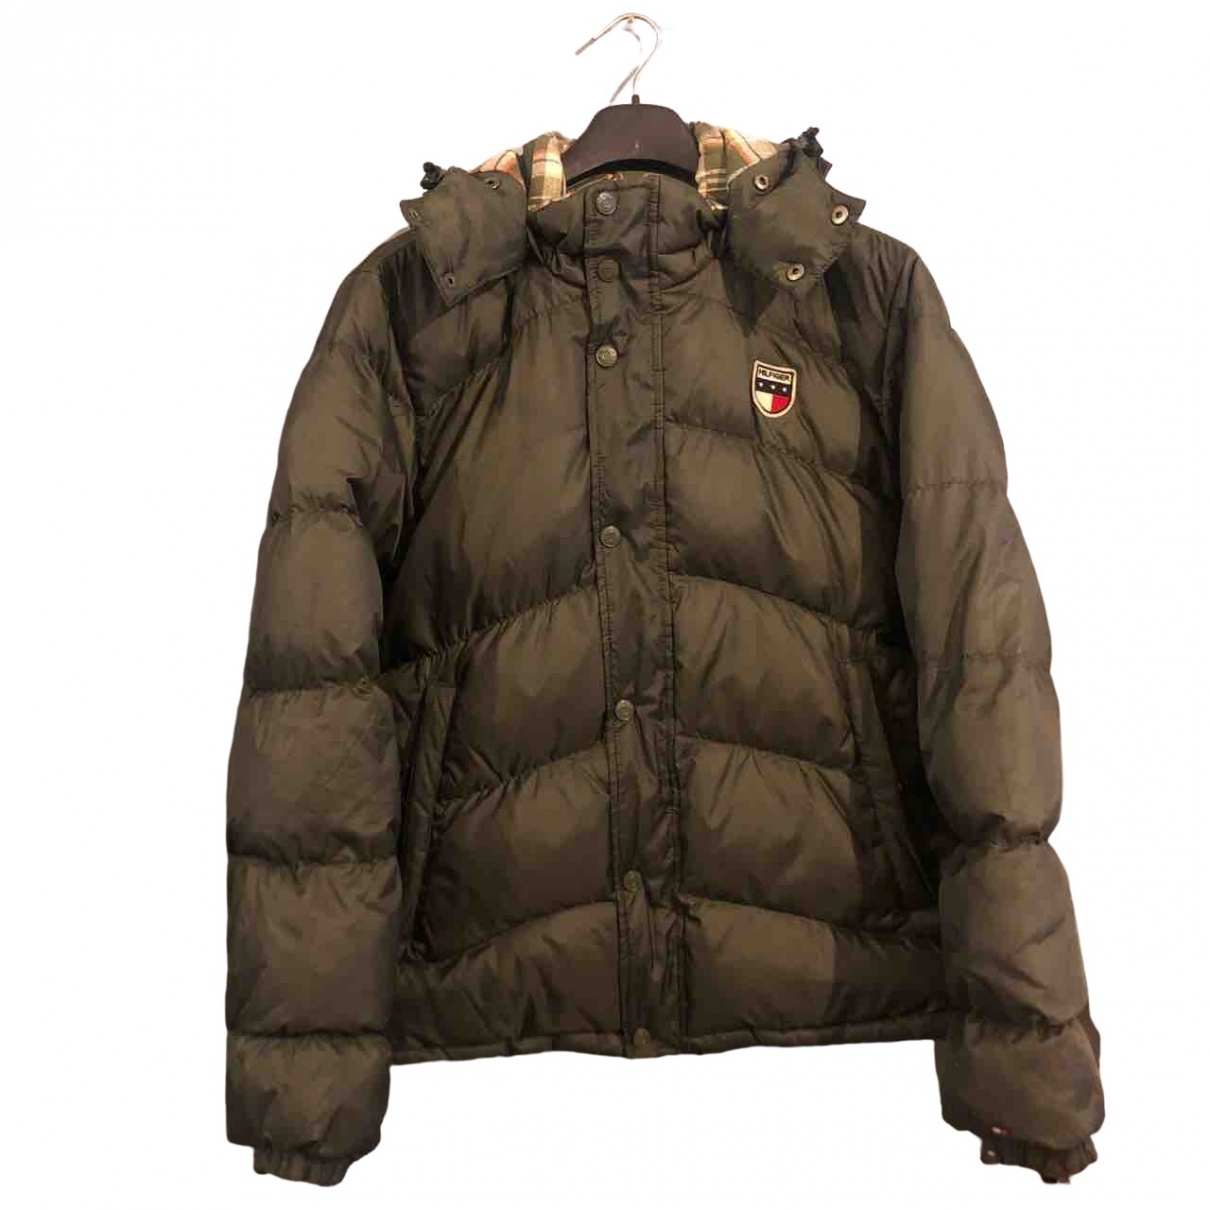 Tommy Hilfiger \N Green coat  for Men XL International